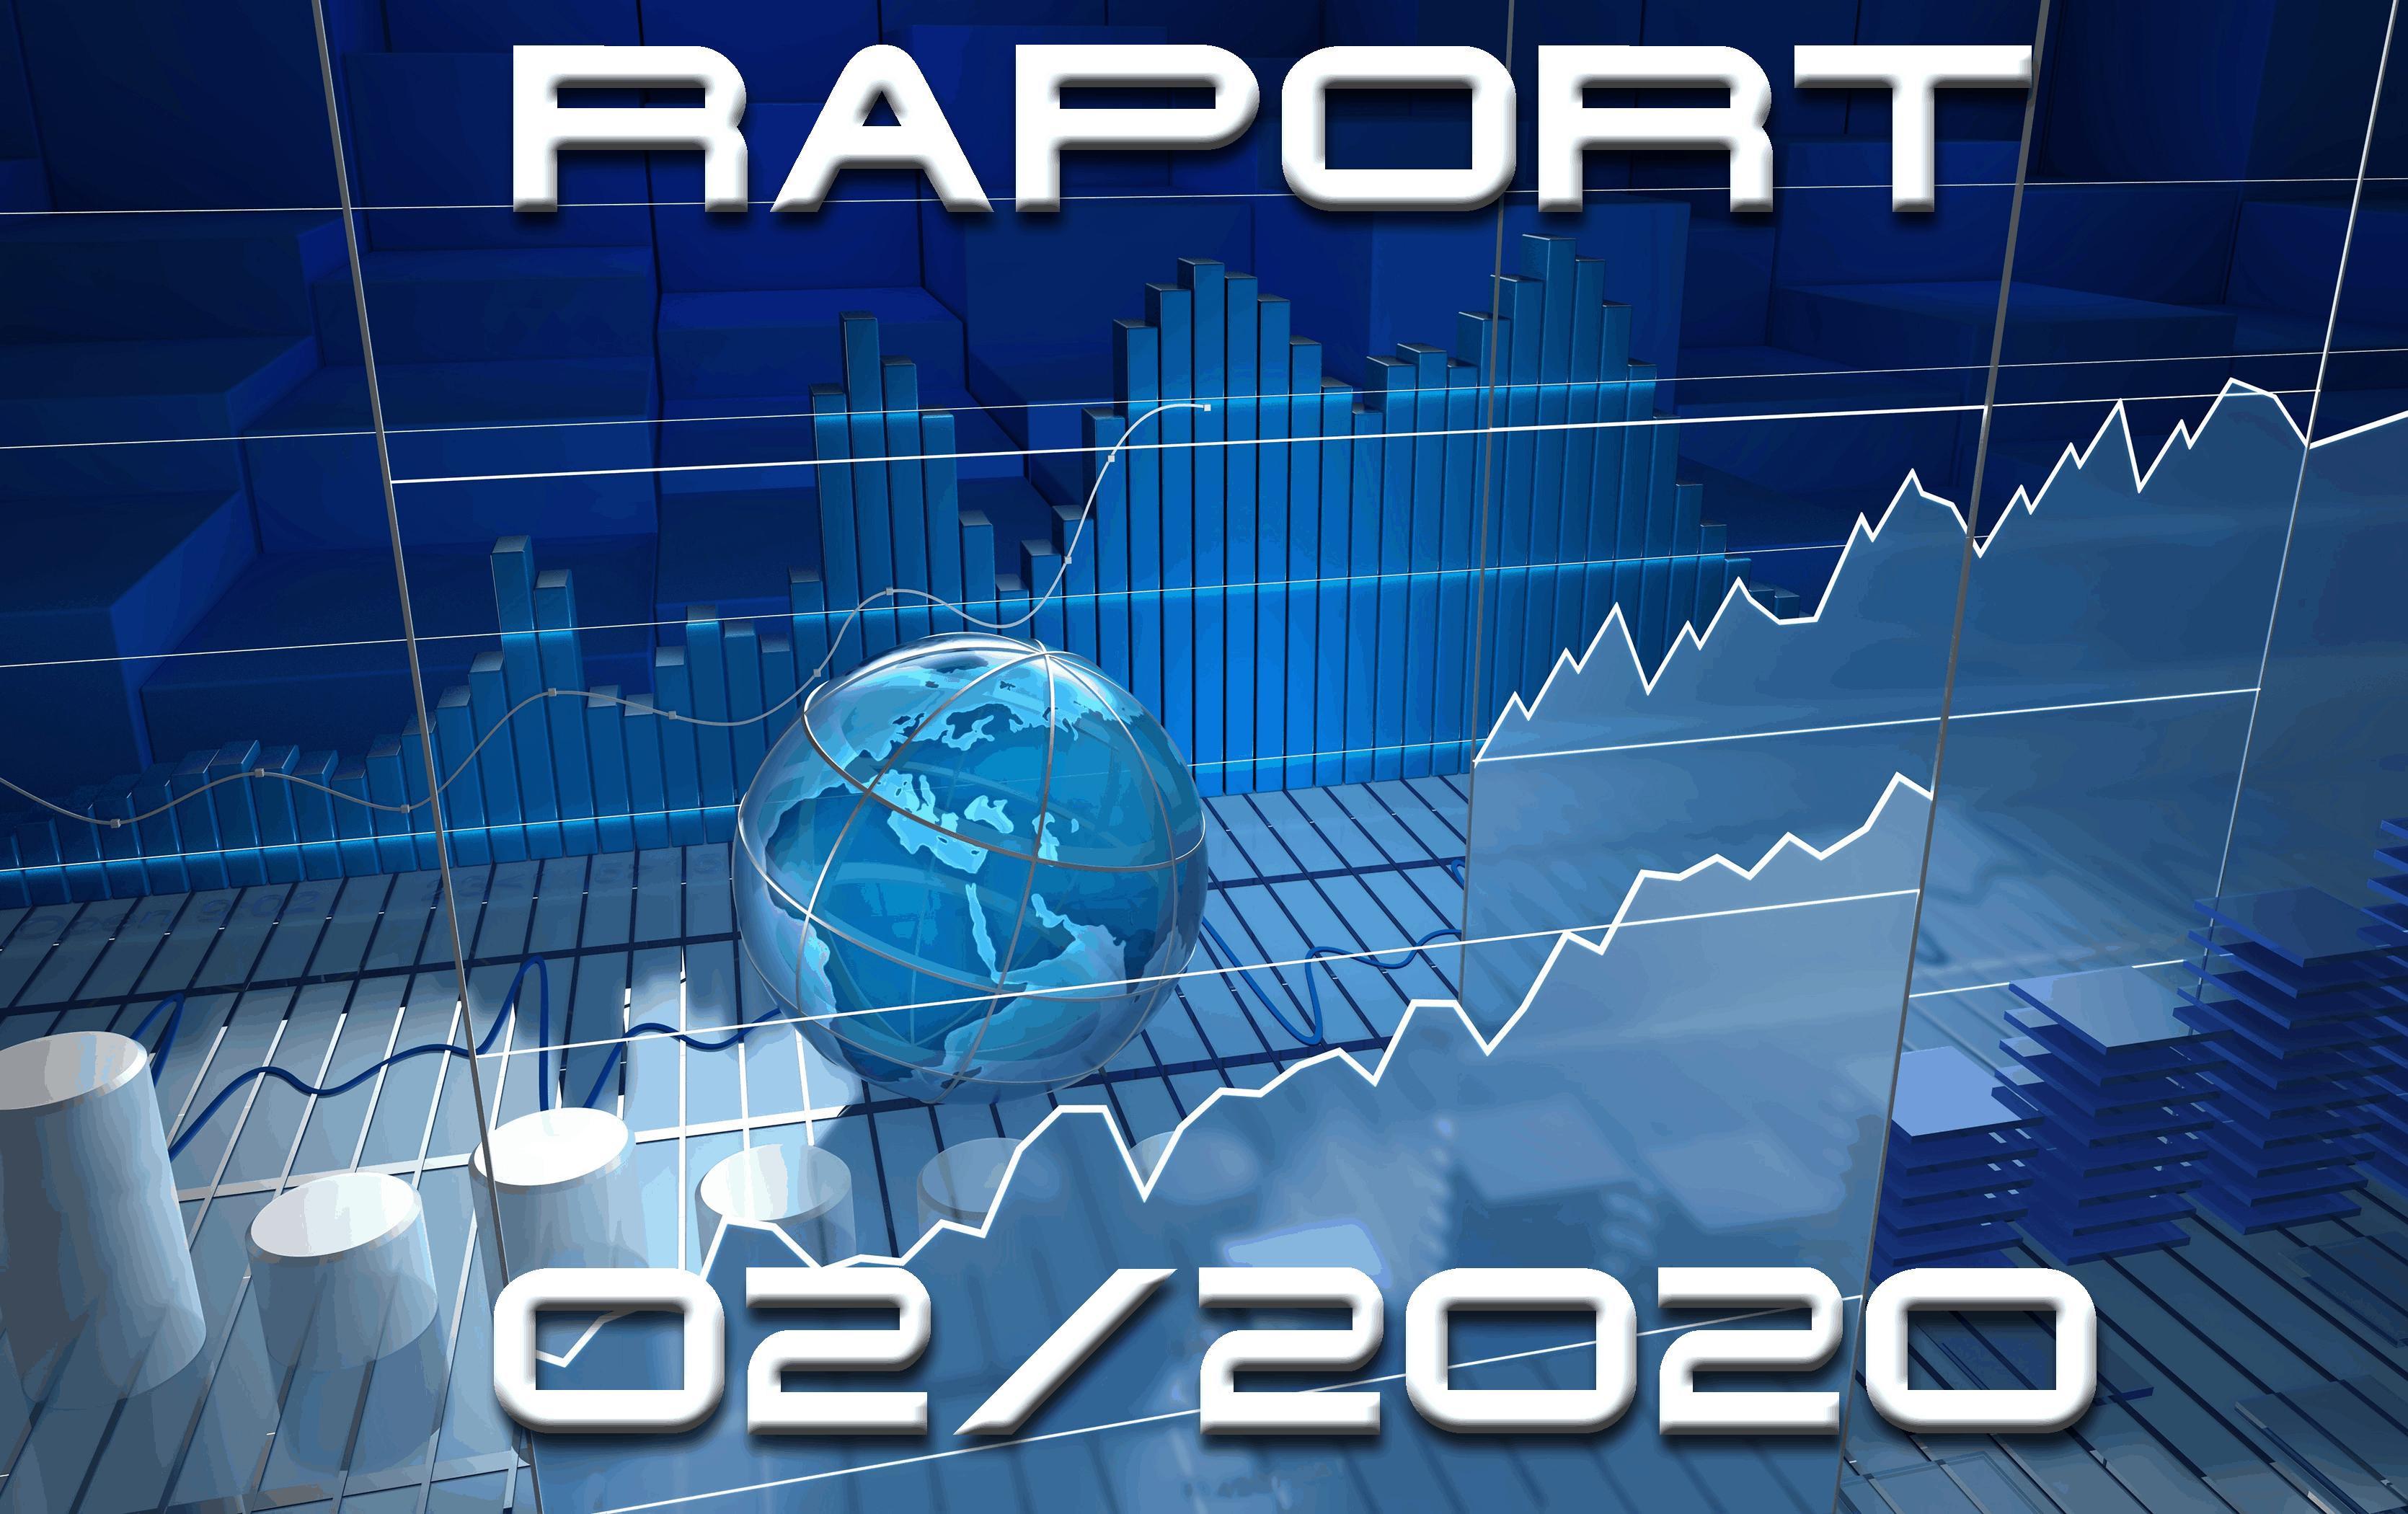 intraday'owa statystyka - raport luty 2020